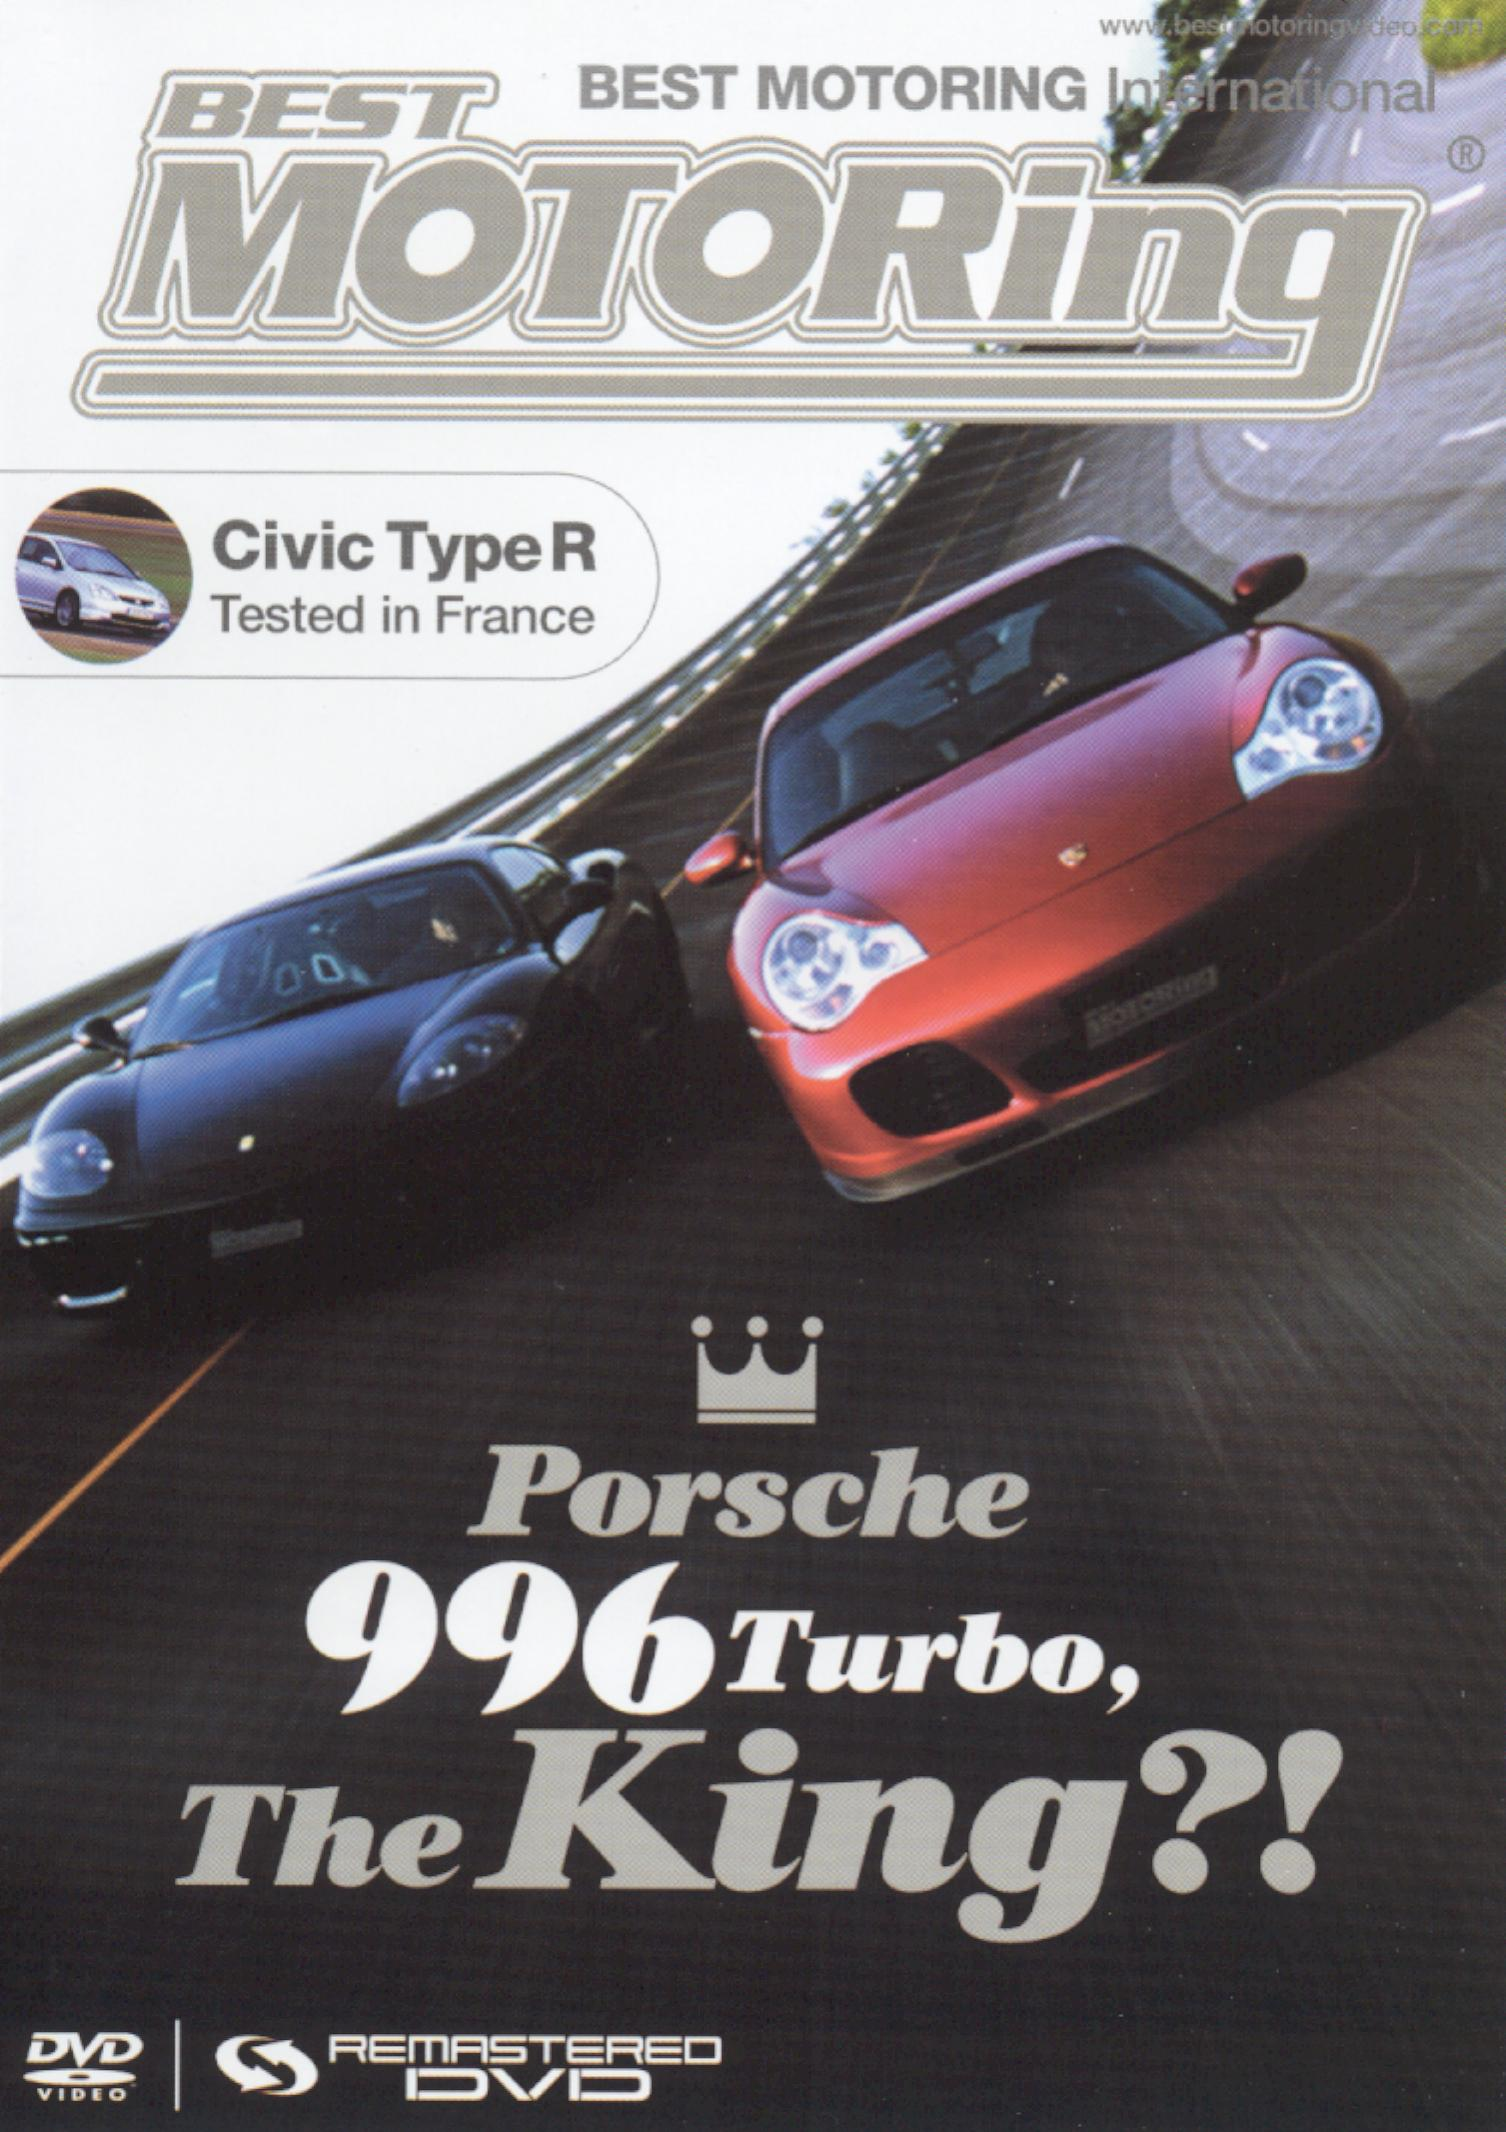 Best Motoring: Porsche 996 Turbo (2003)